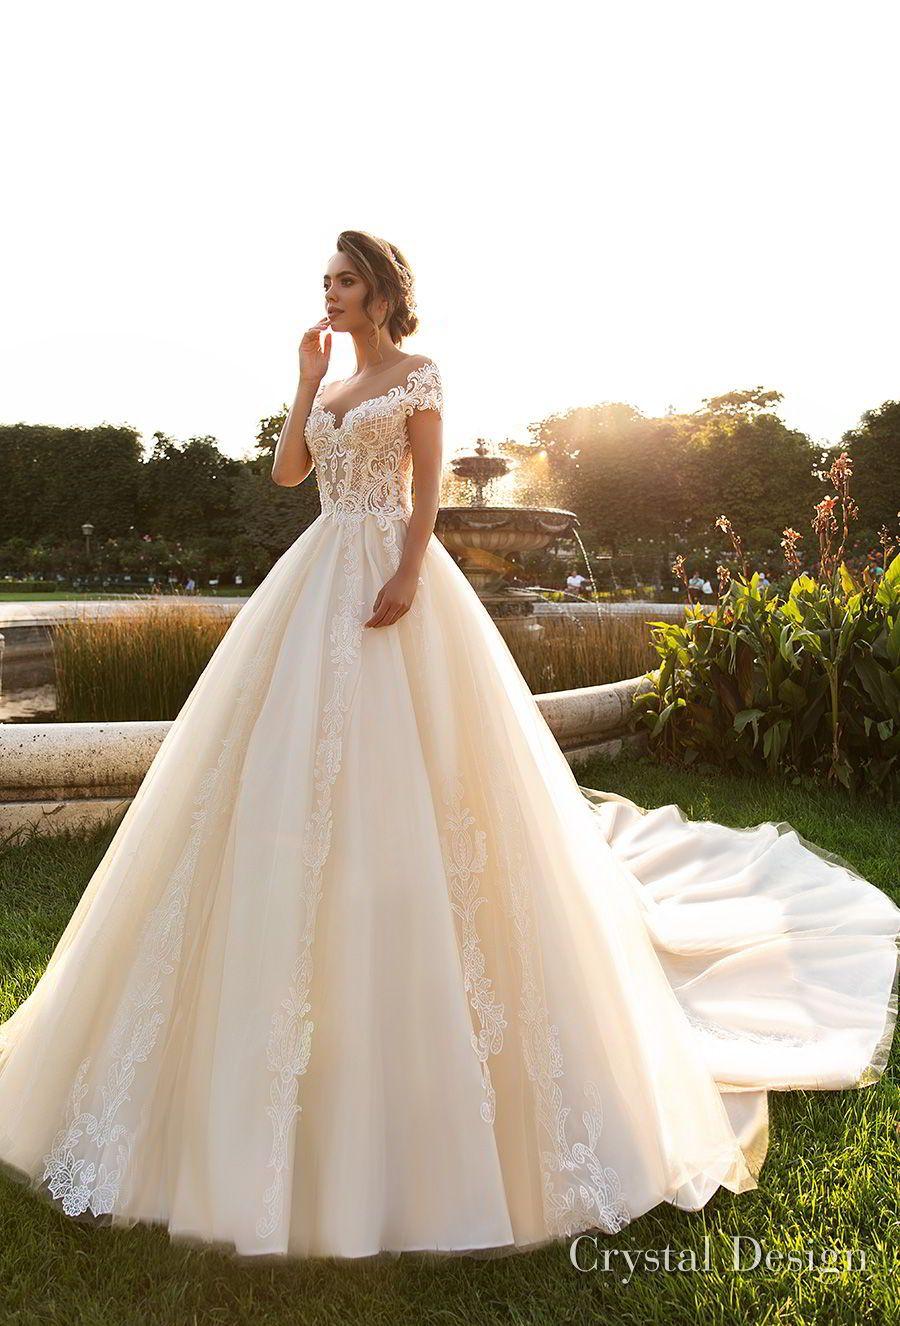 Crystal Design 2018 Wedding Dresses Royal Garden Haute Couture Bridal Collections Wedding Inspirasi Petite Wedding Dress Ball Gowns Wedding Bridal Wedding Dresses [ 1326 x 900 Pixel ]